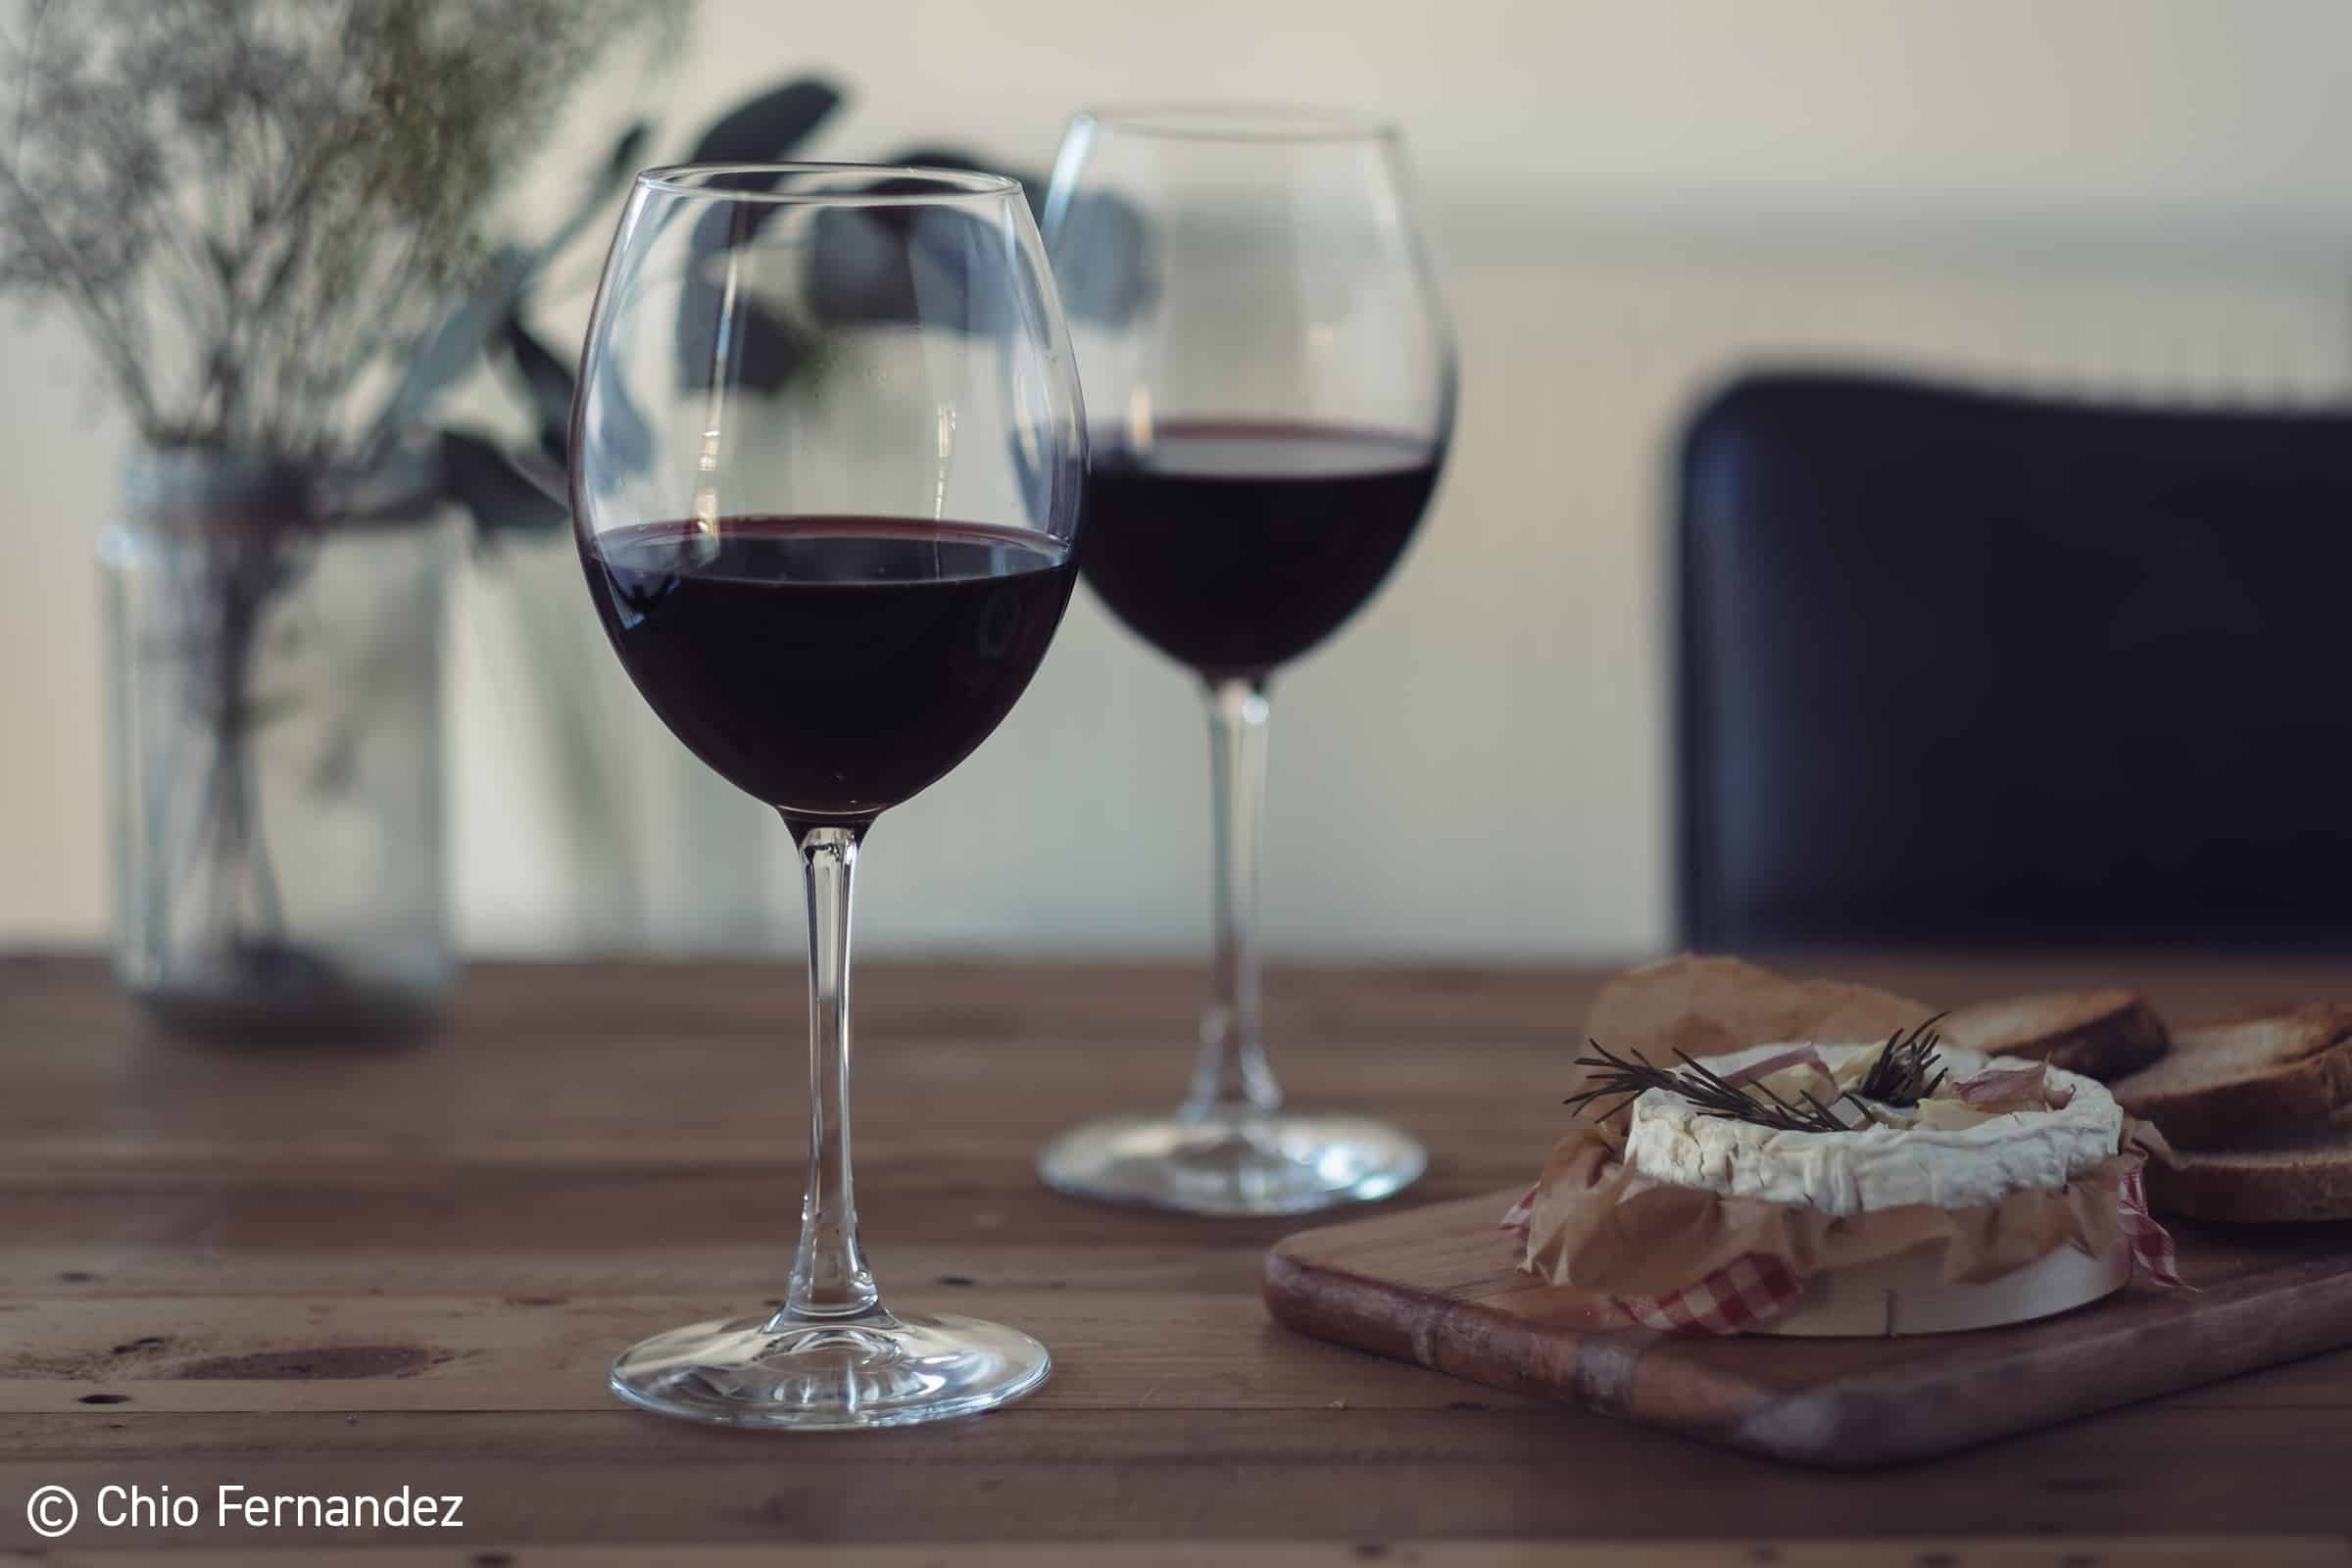 DSCF4343 - wine pic1